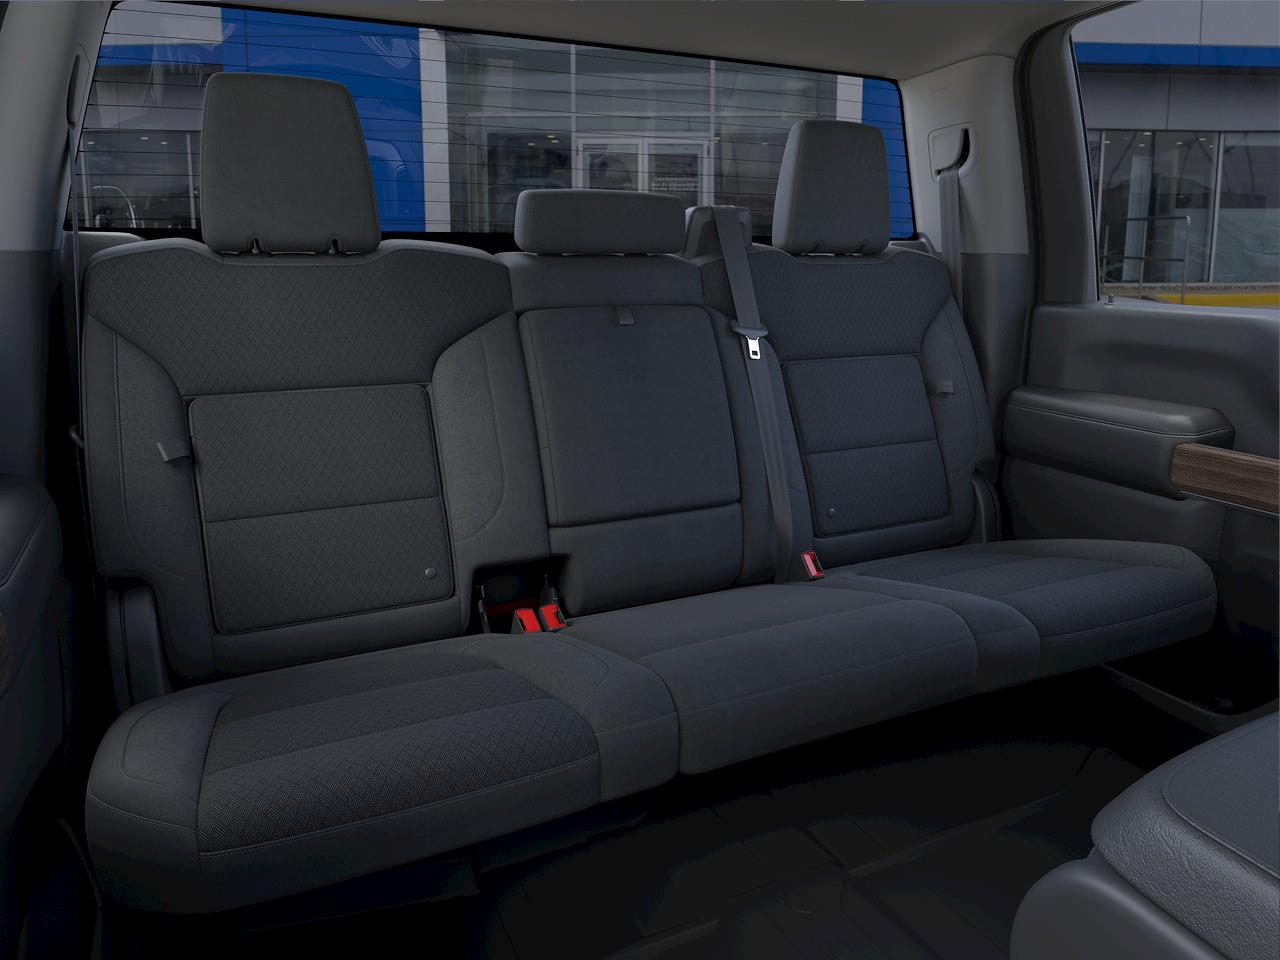 2021 Chevrolet Silverado 2500 Crew Cab 4x4, Pickup #M1387 - photo 14